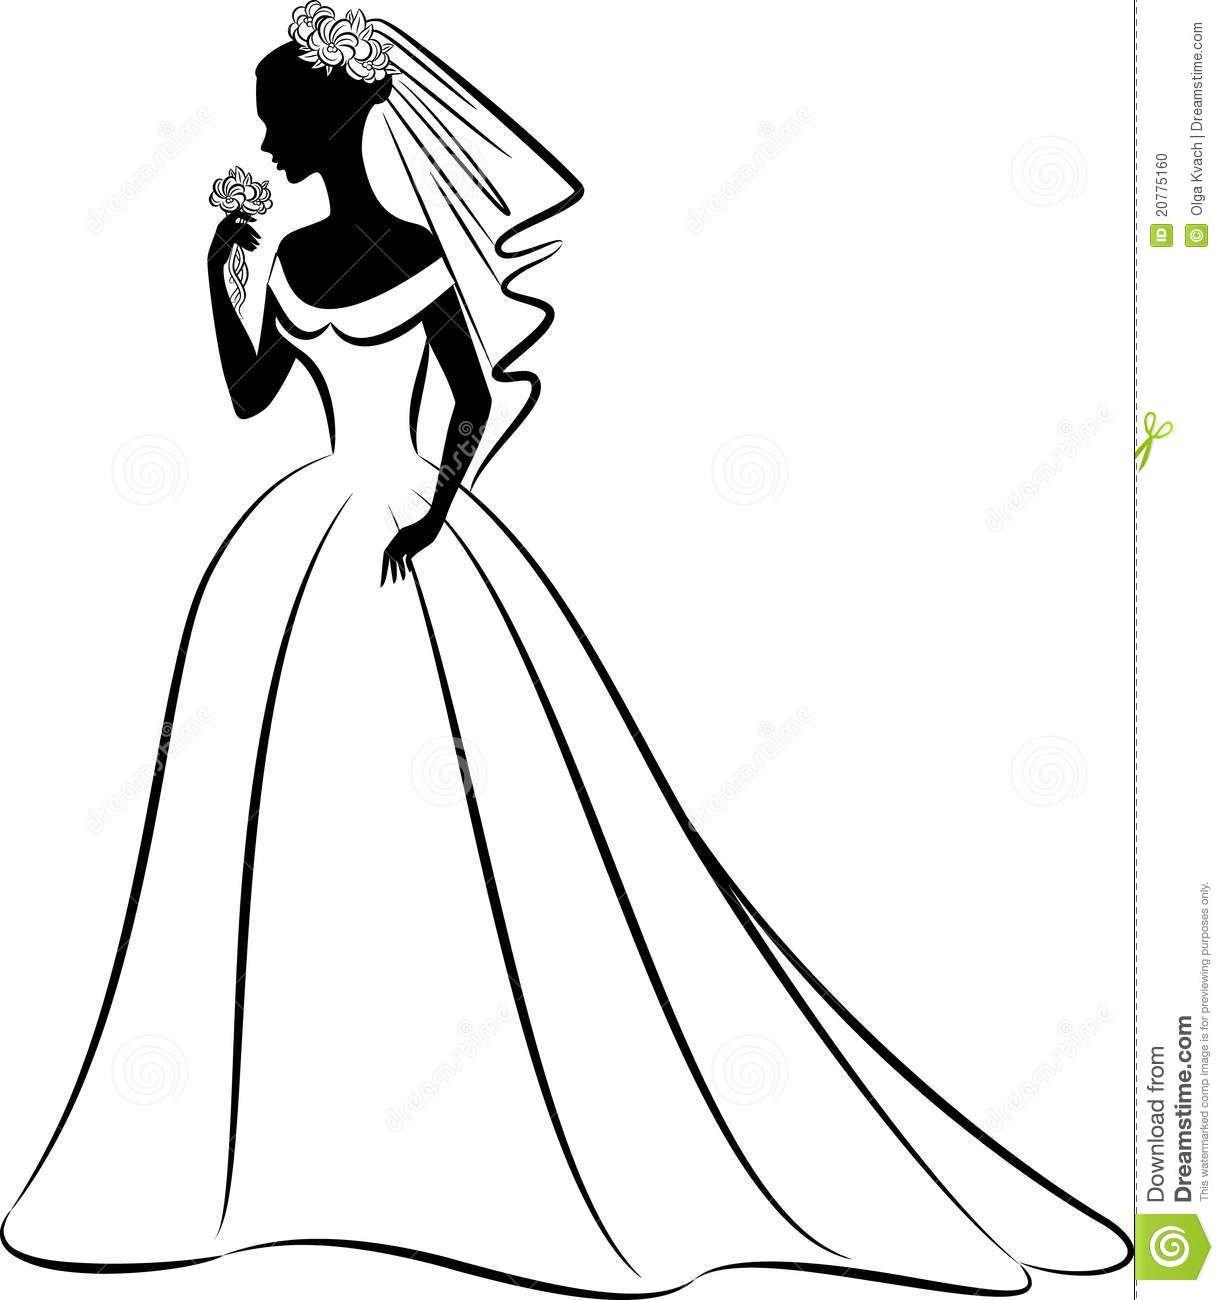 Cartoon wedding dress clipart vector royalty free download Wedding+dress+clipart | Ideas for the house | Wedding silhouette ... vector royalty free download